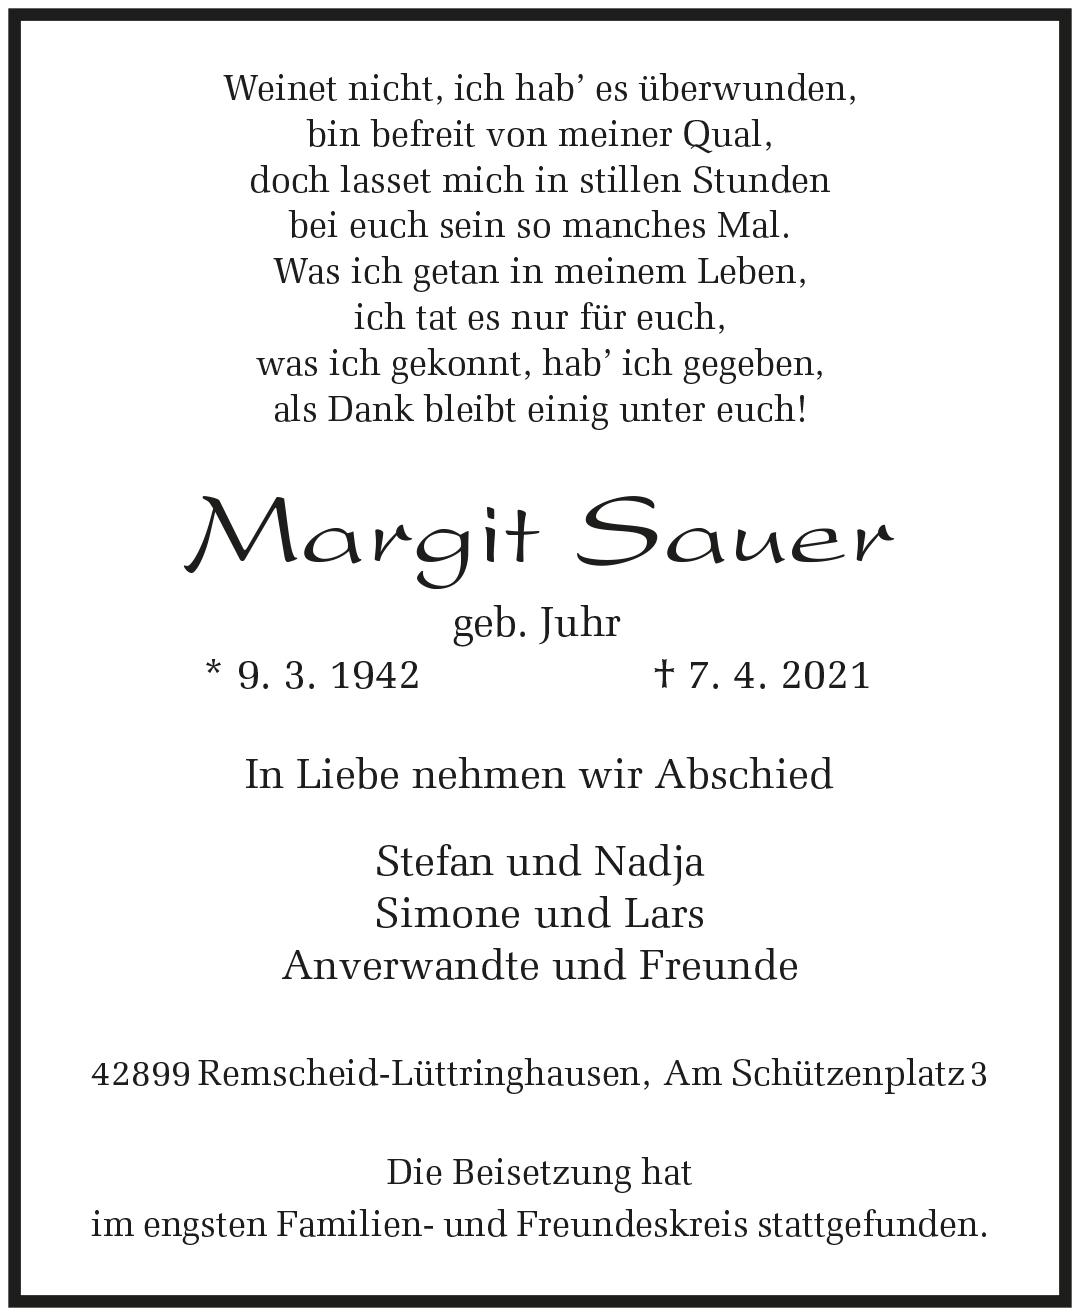 Margit Sauer